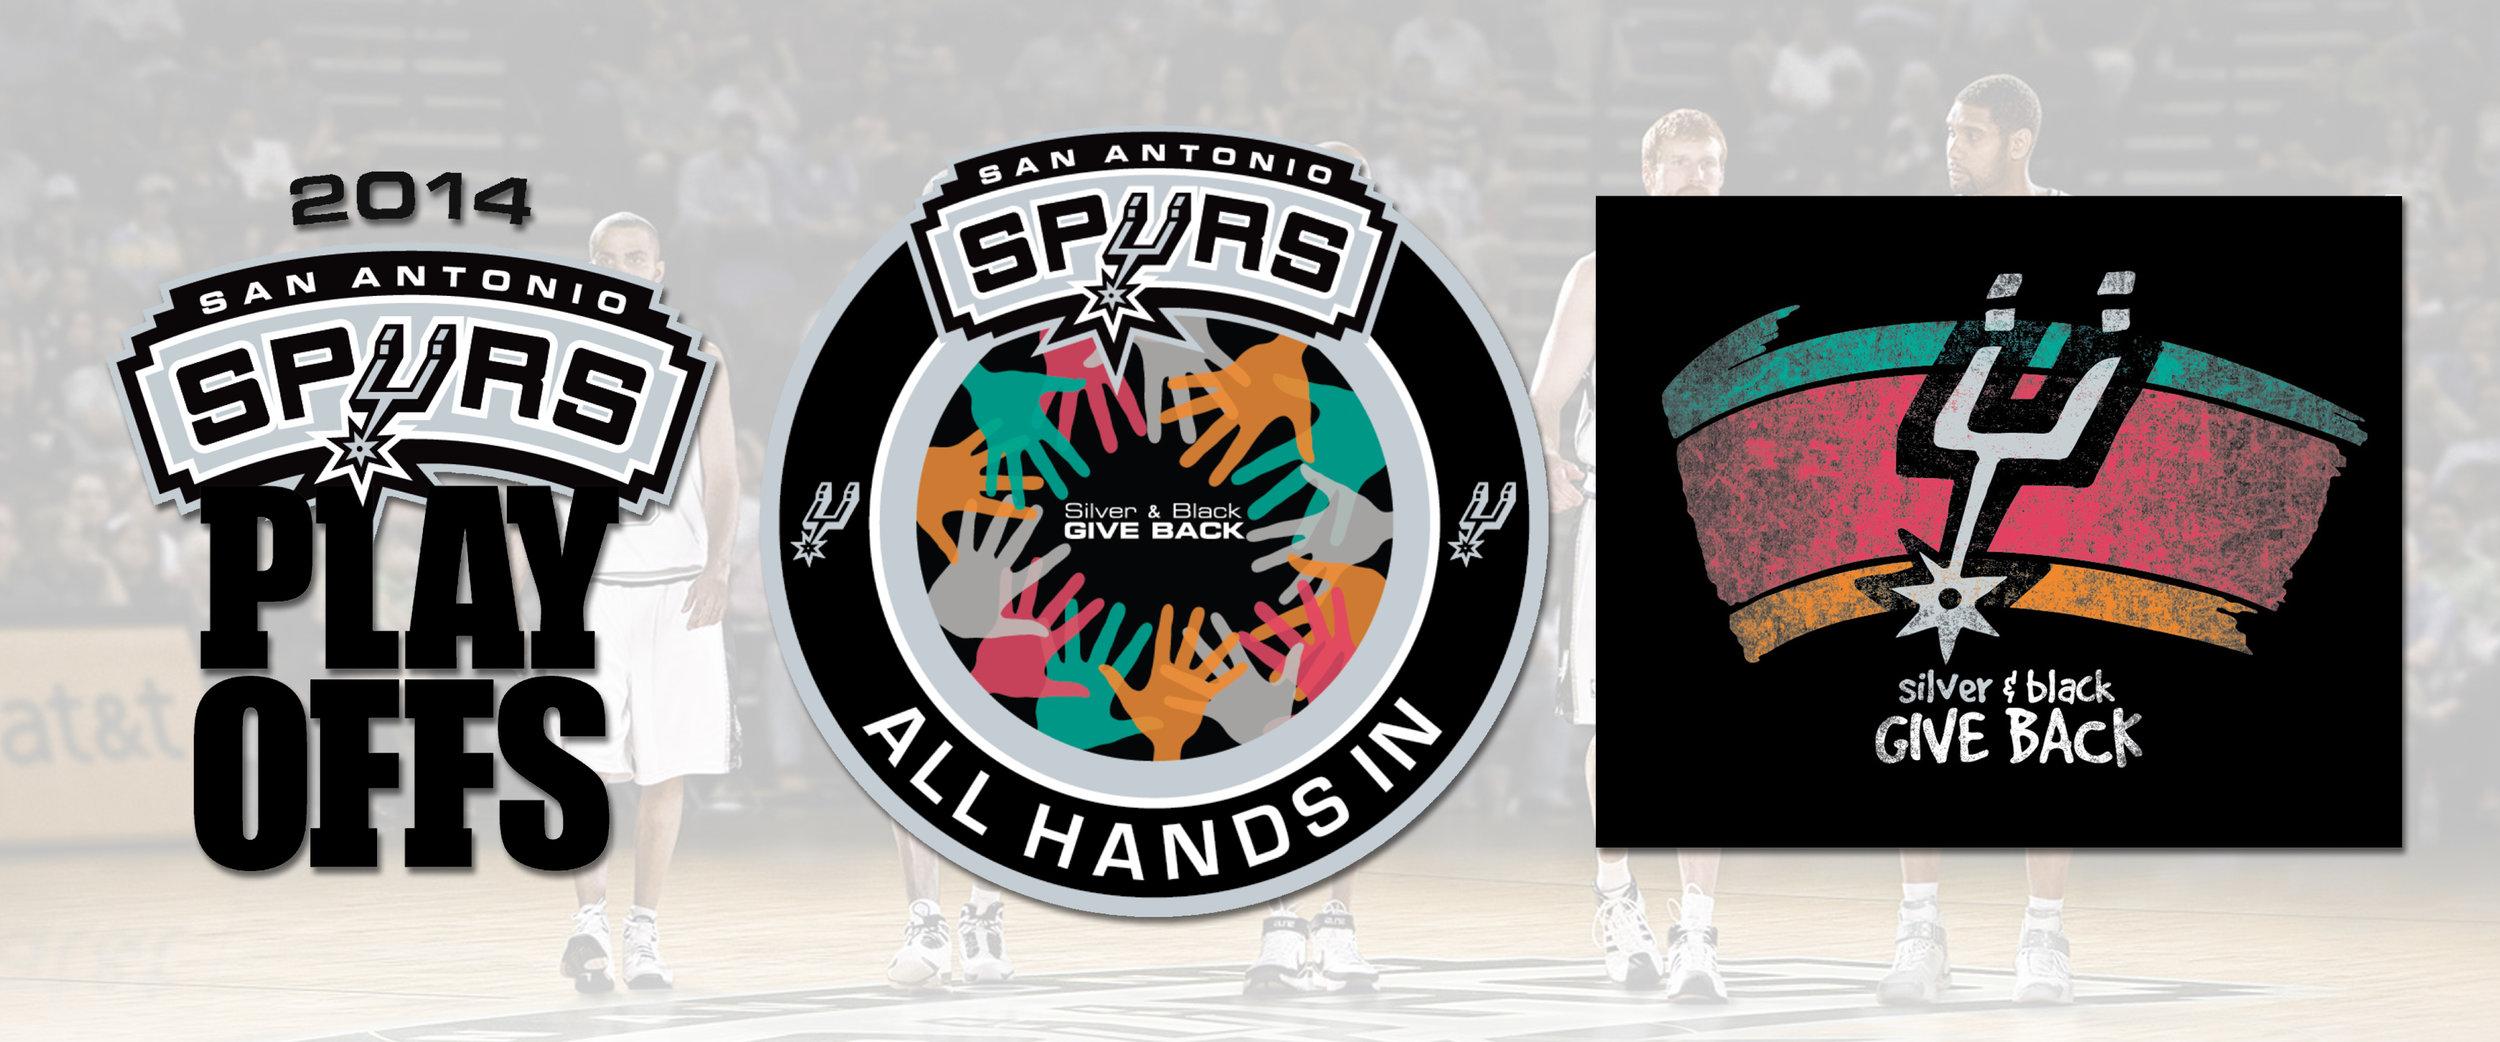 Wears My Shirt - Custom Products Anything - San Antonio Spurs 2.jpg